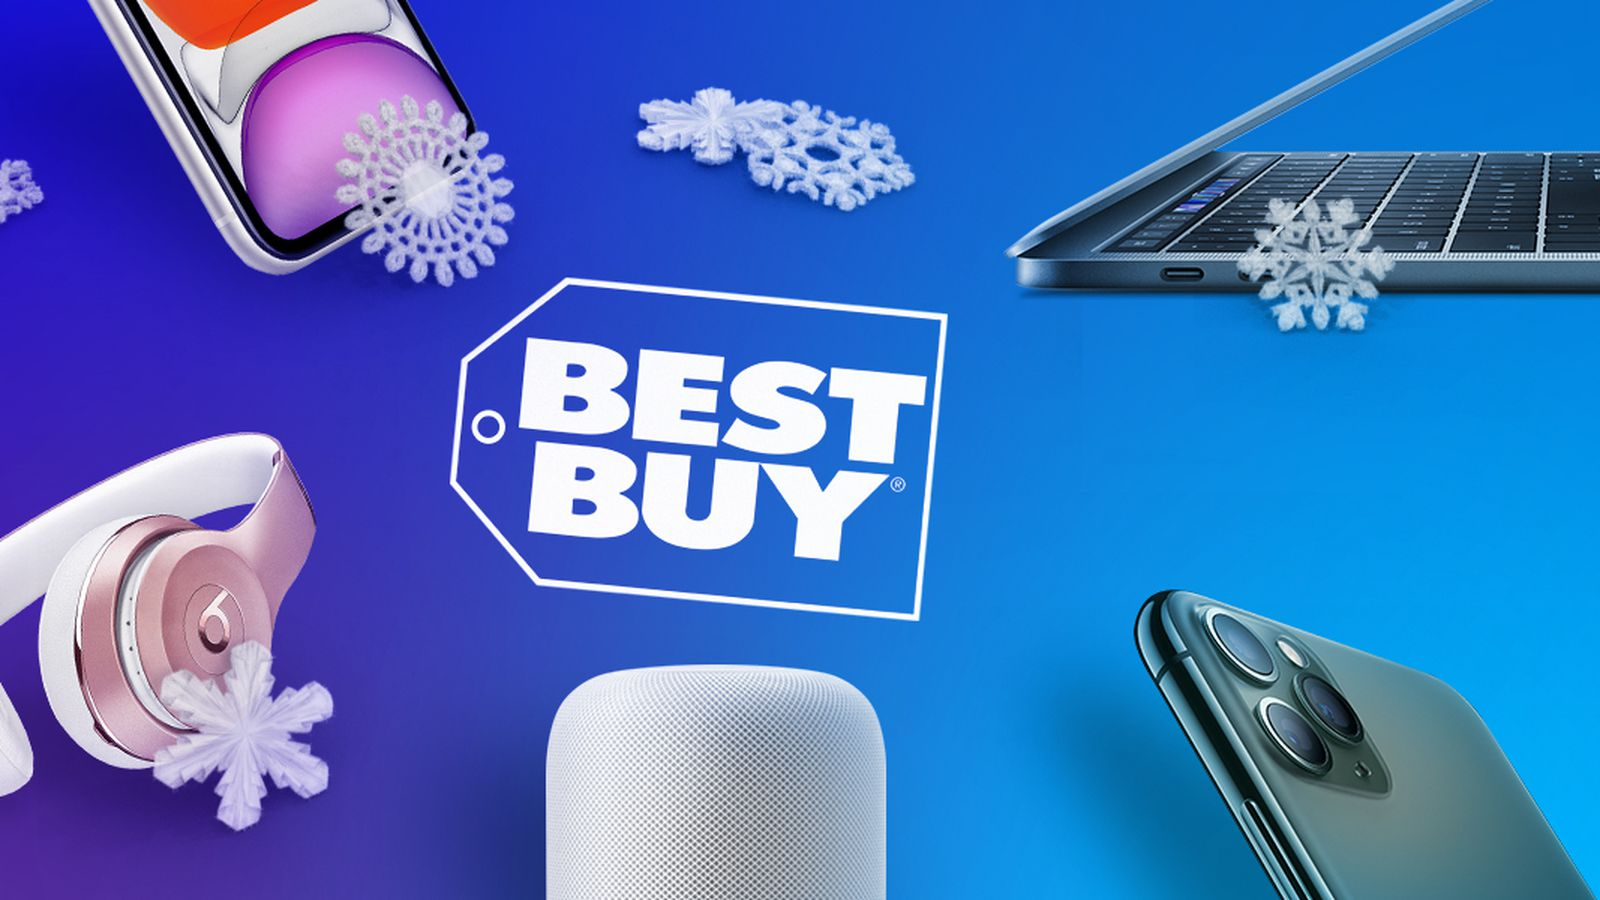 Psa Best Buy S Rewards Program No Longer Offers Points On Apple Products Macrumors